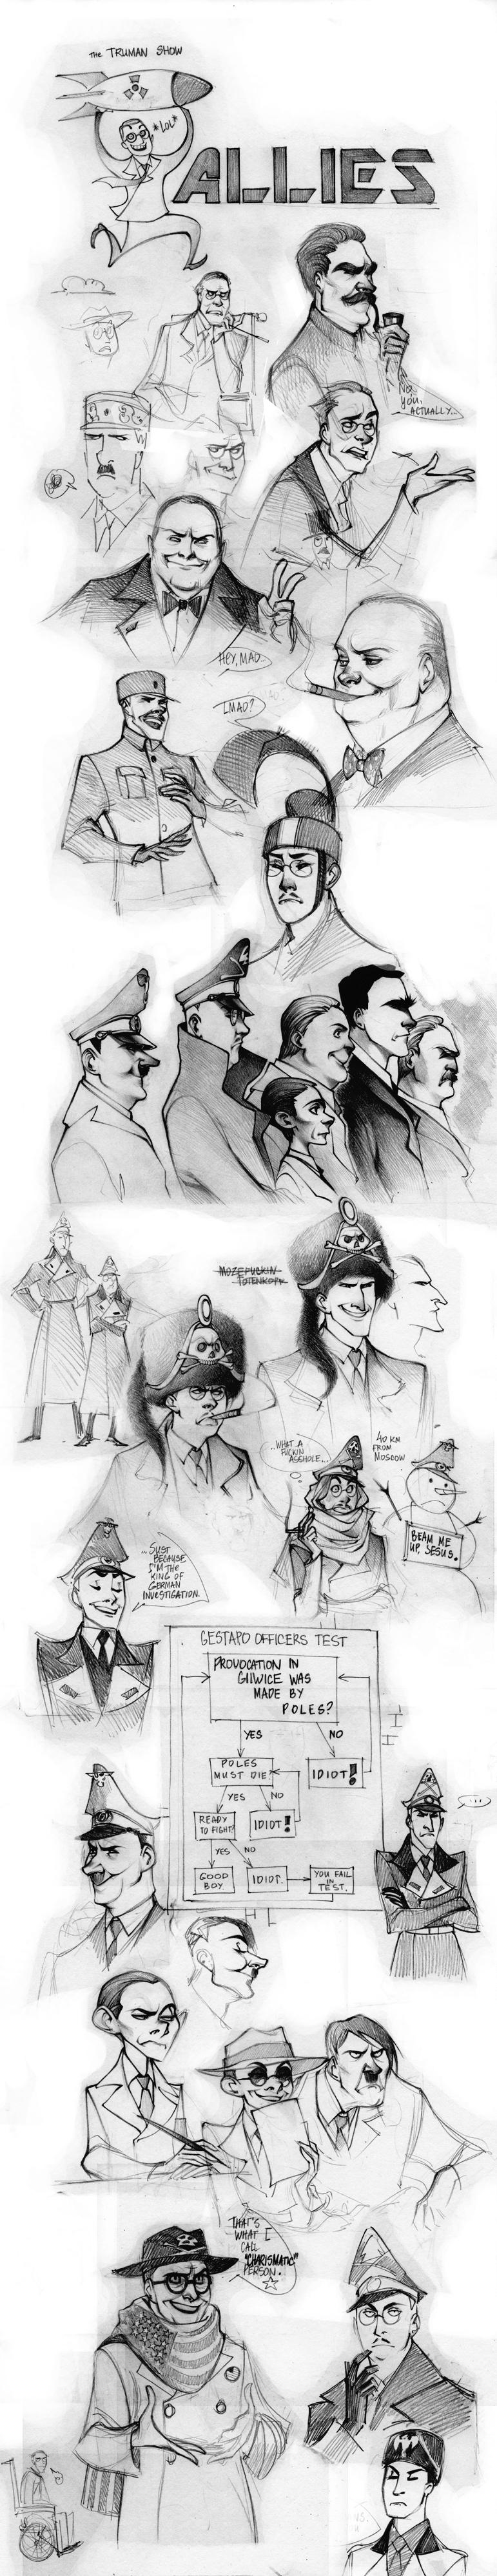 WW2 Sketch dump by Phobs.deviantart.com on @deviantART